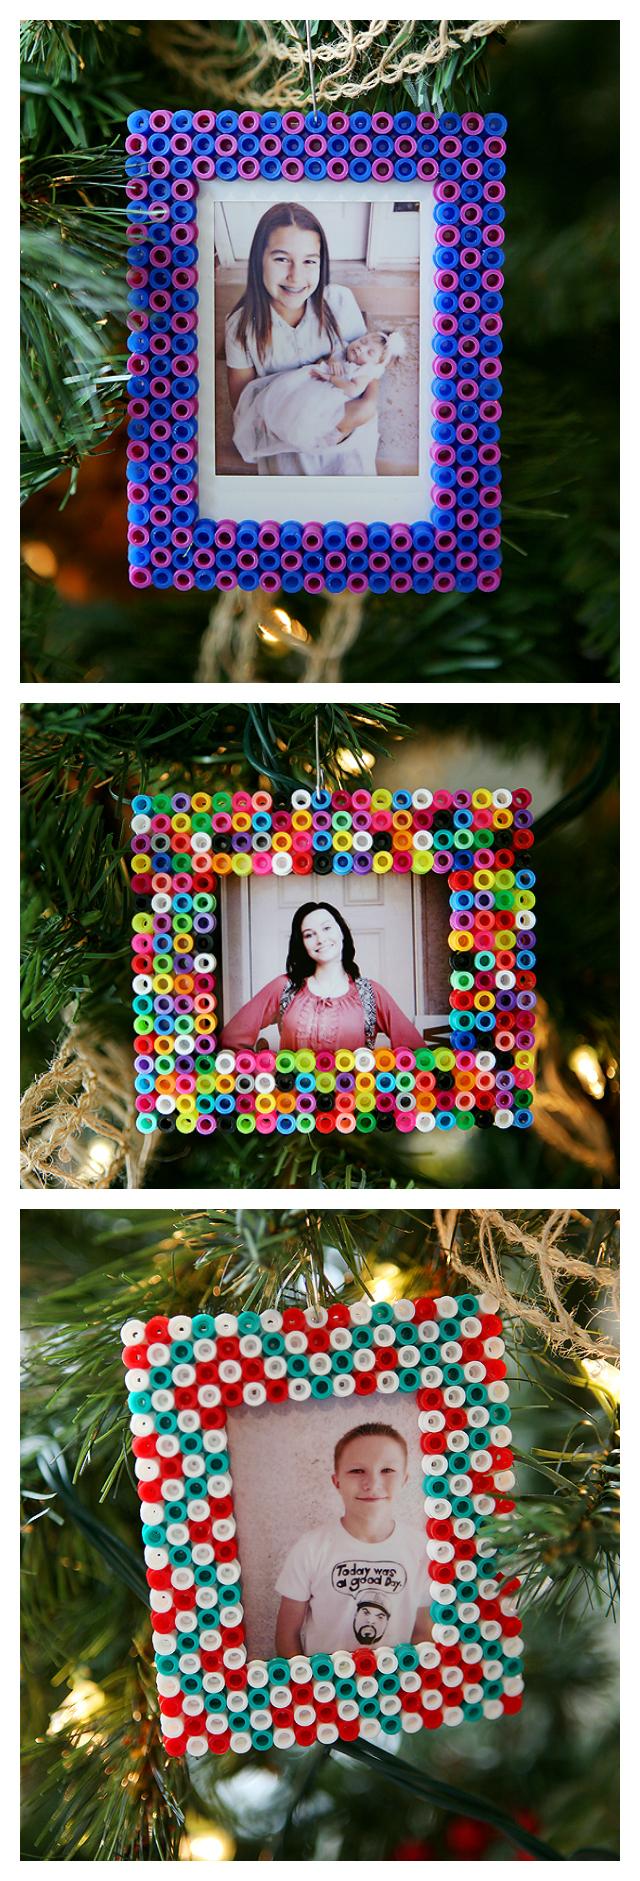 Perler Bead Christmas Ornaments | Ornaments kids can make